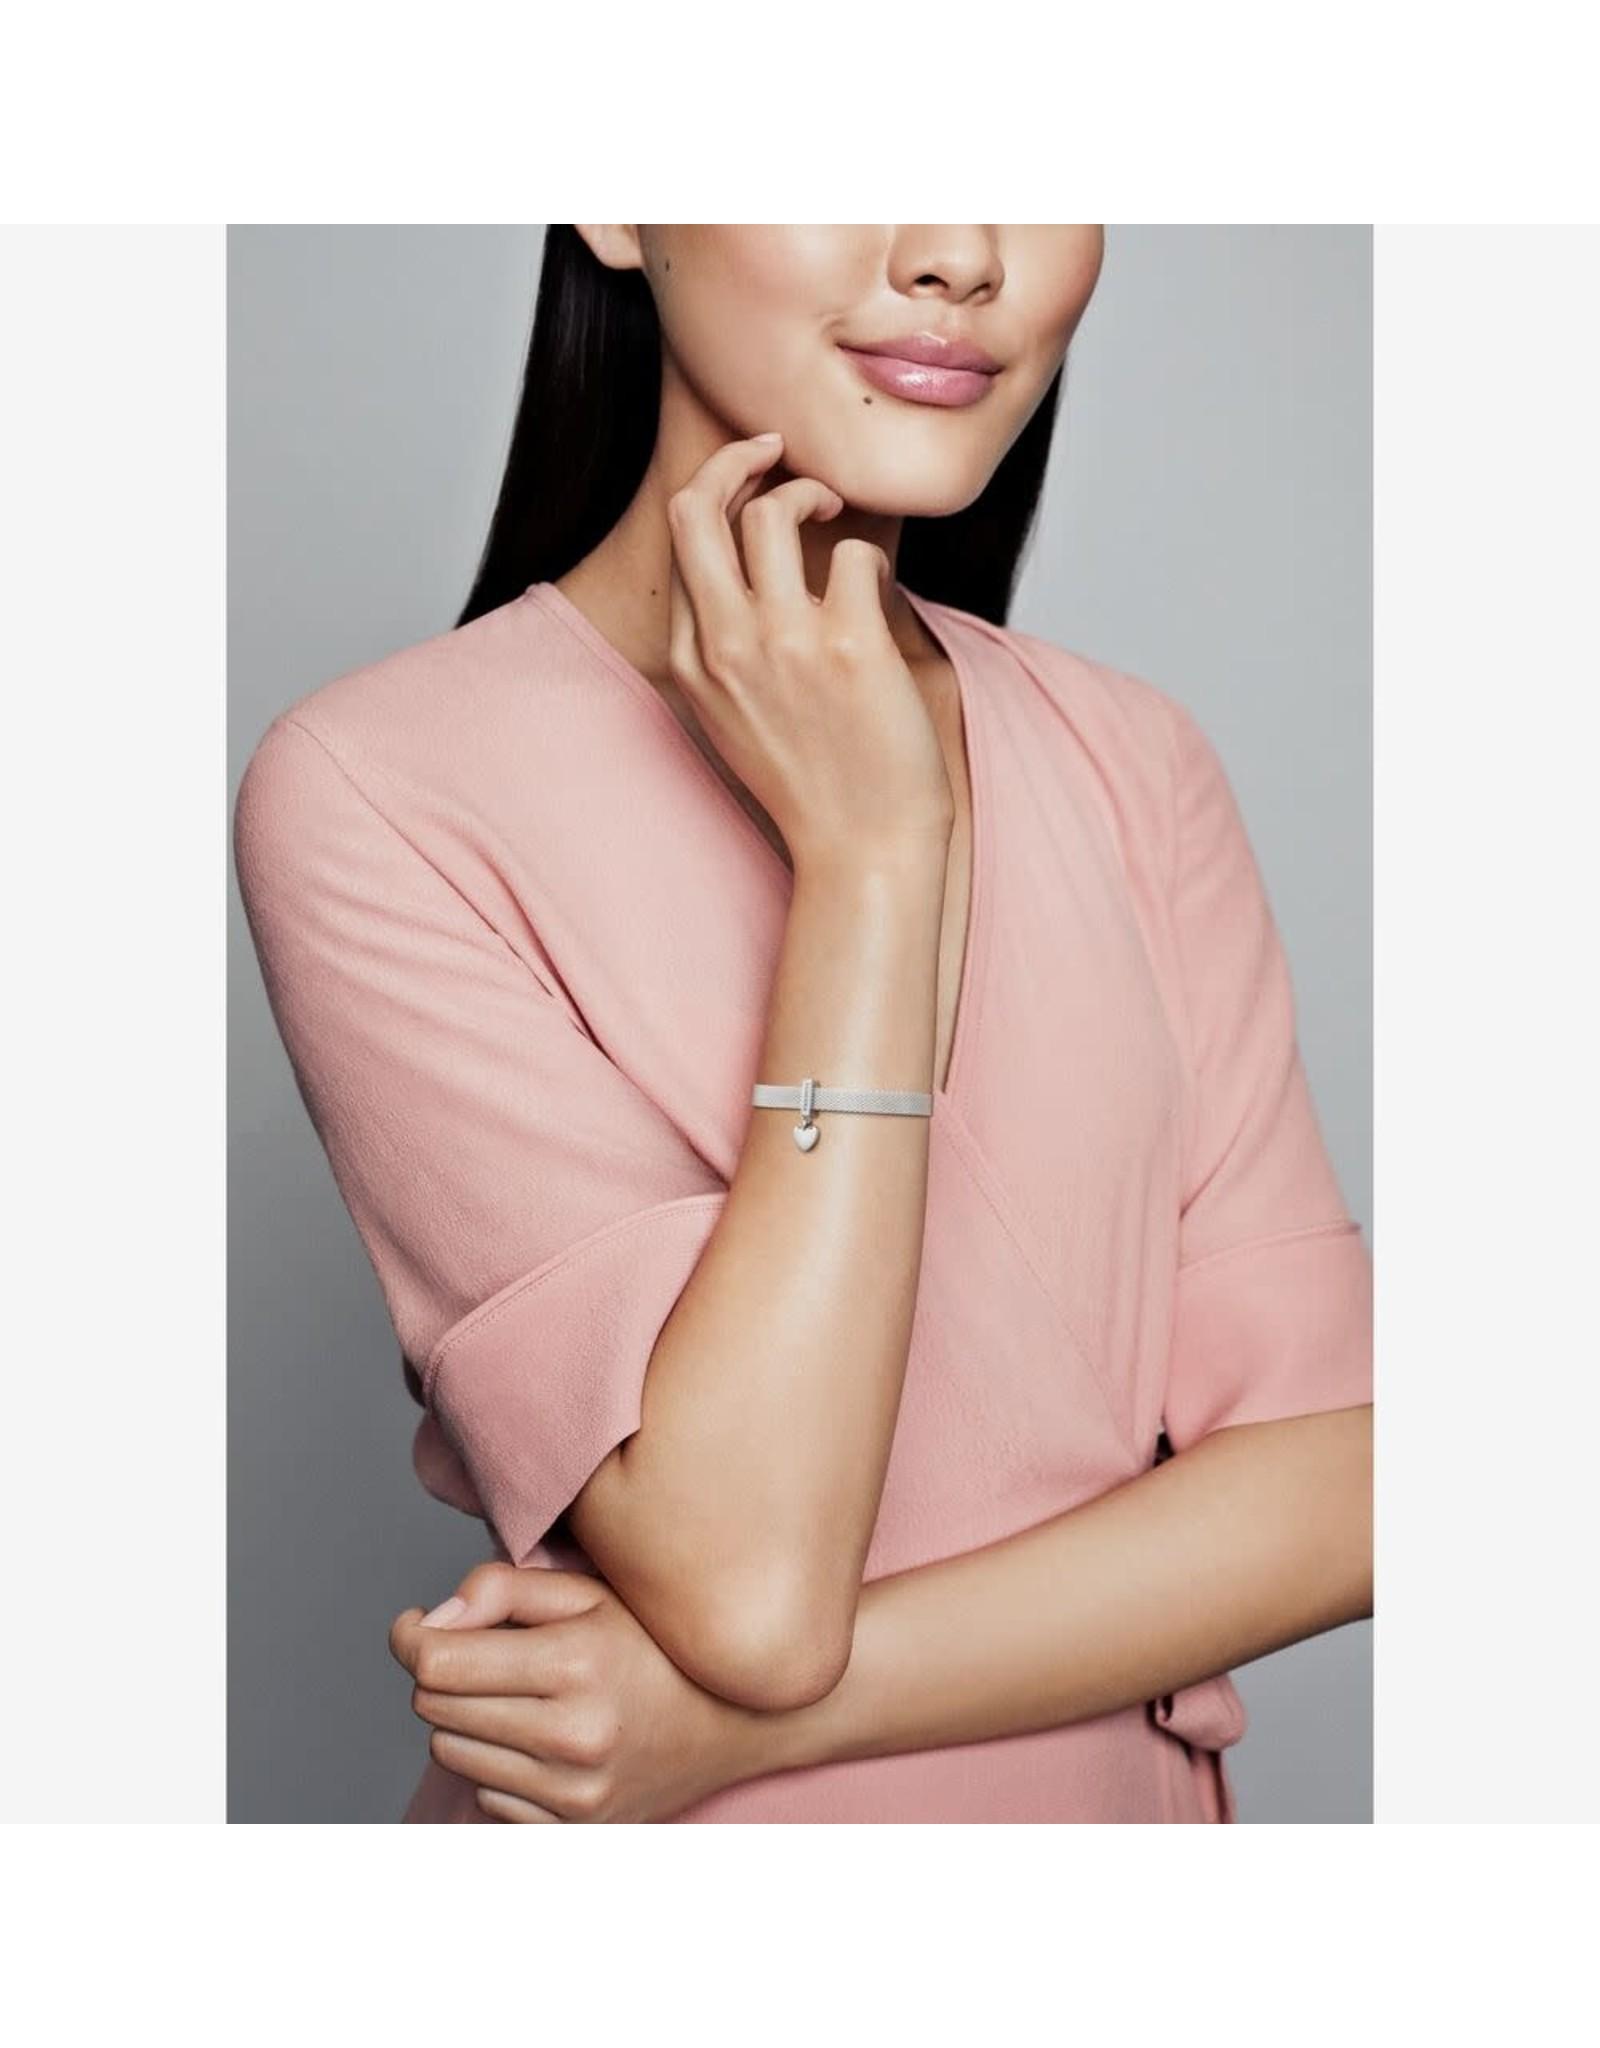 Pandora Pandora Reflexions Dangling Heart Clip Charm In Sterling Silver